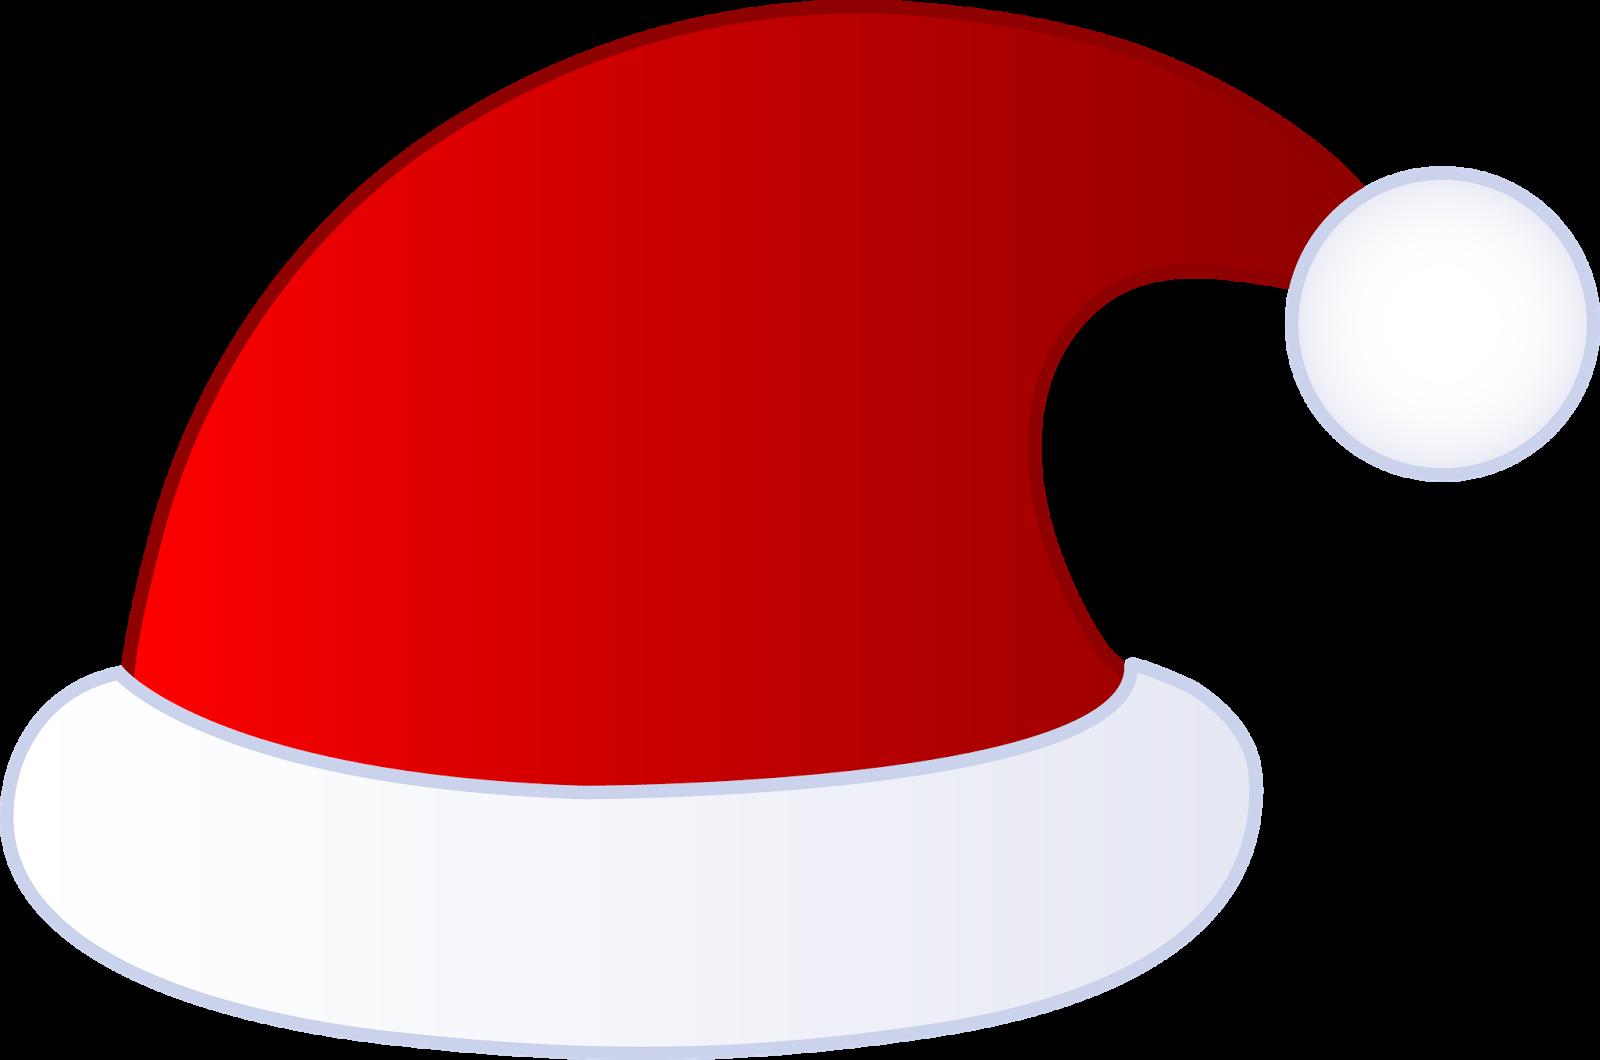 Santa hat template images clip art